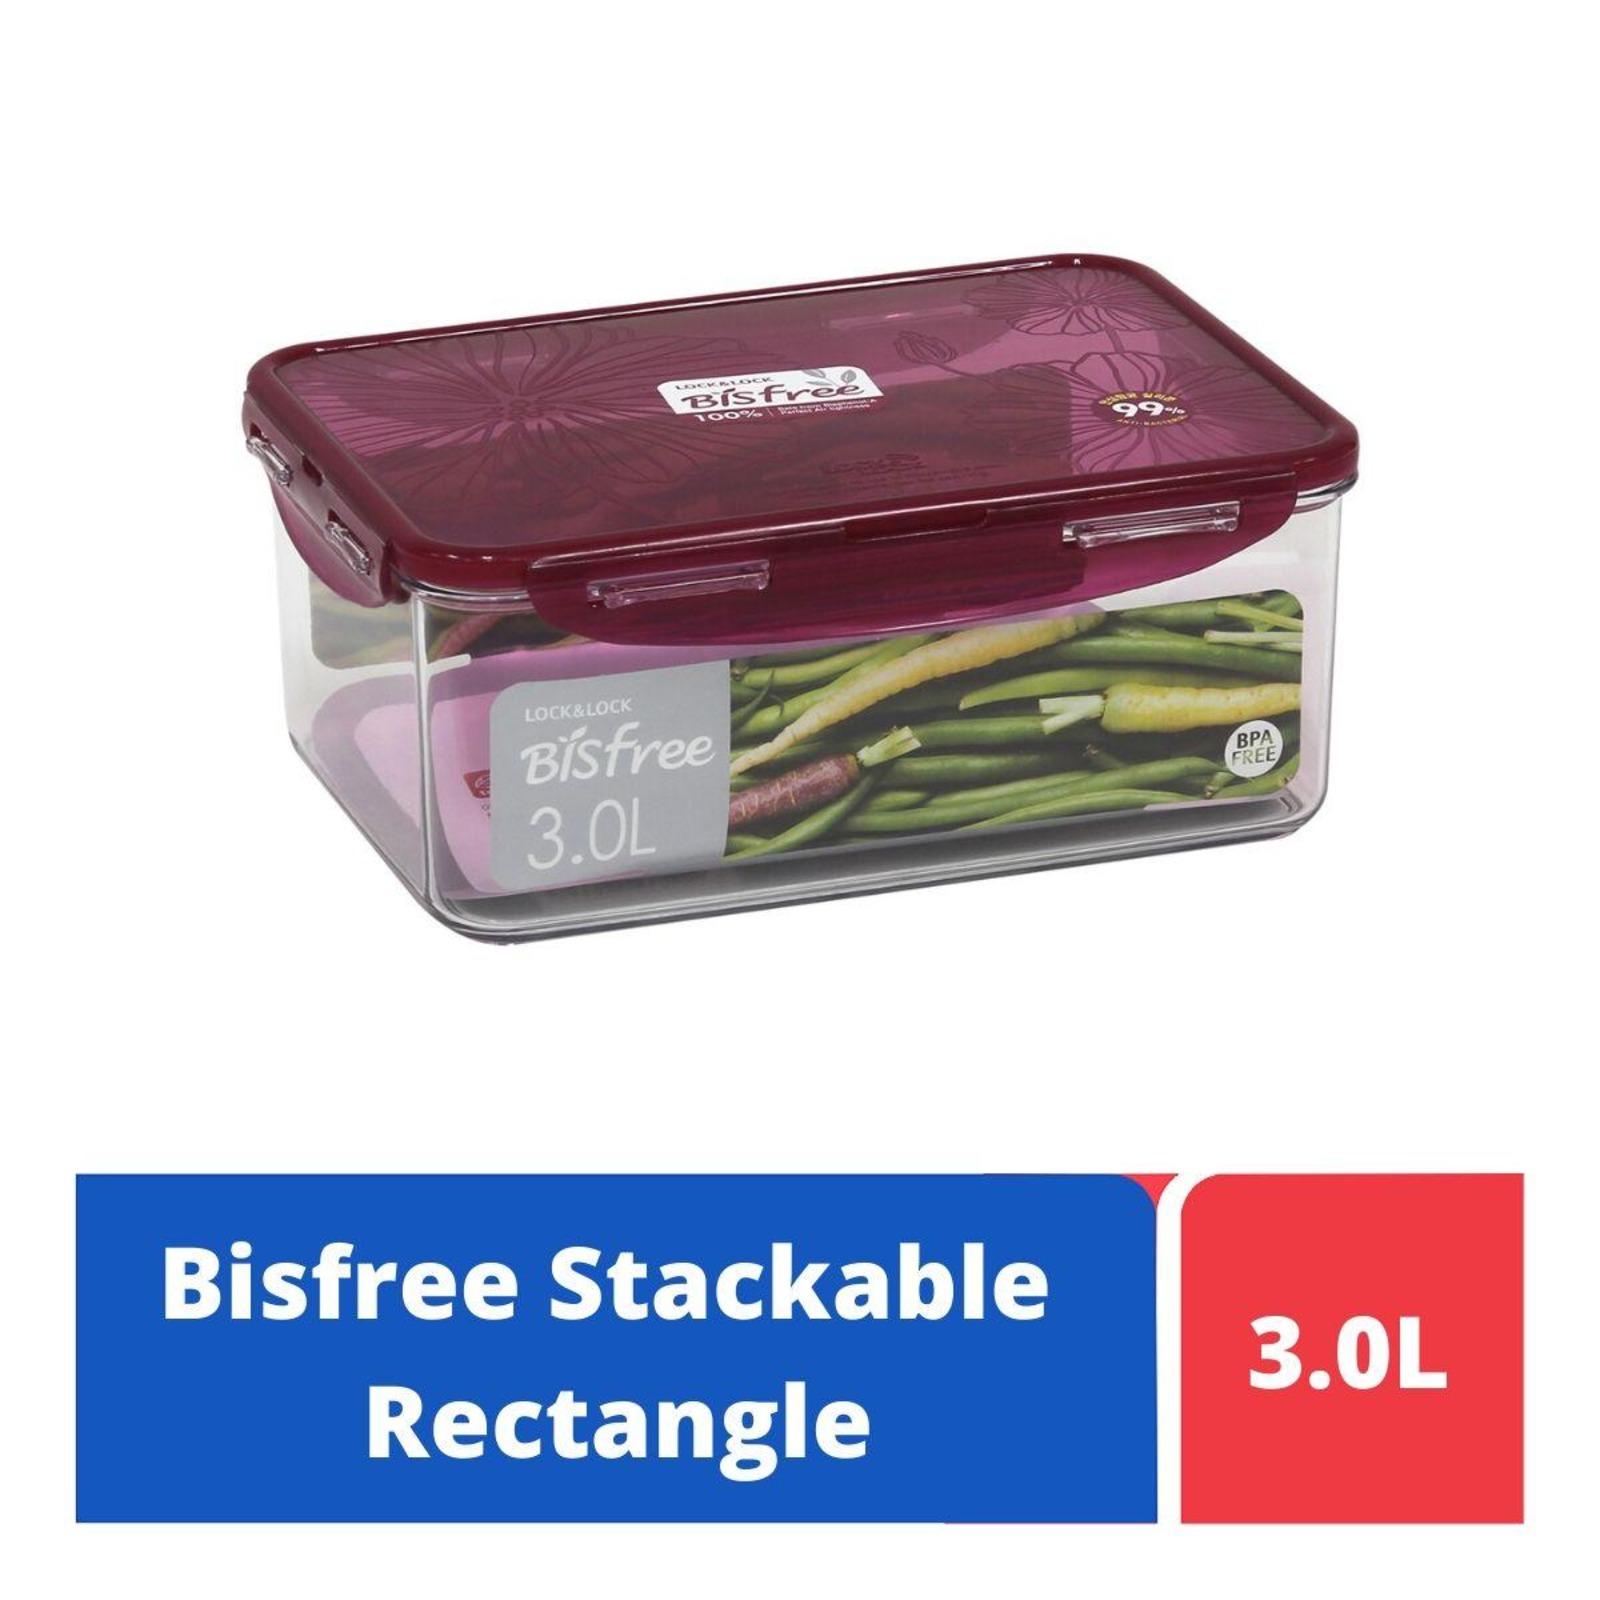 LOCK&LOCK Bisfree Food Container 3L - Red